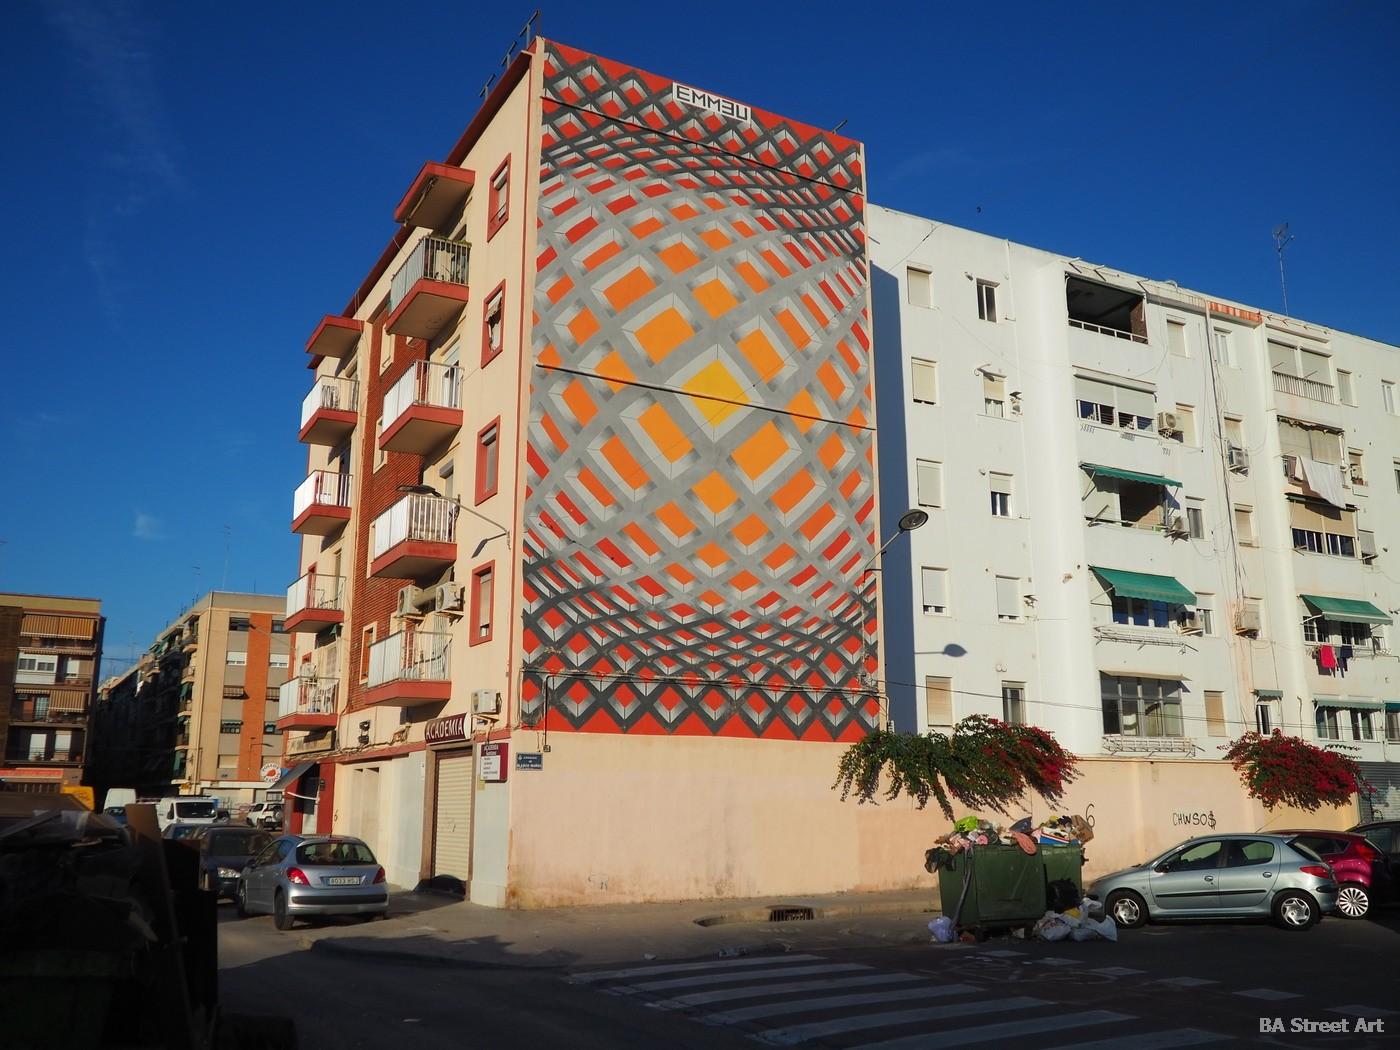 emmeu artist italy italiano mural valencia cabanyal españa spain arte callejero geometria buenosairesstreetart.com